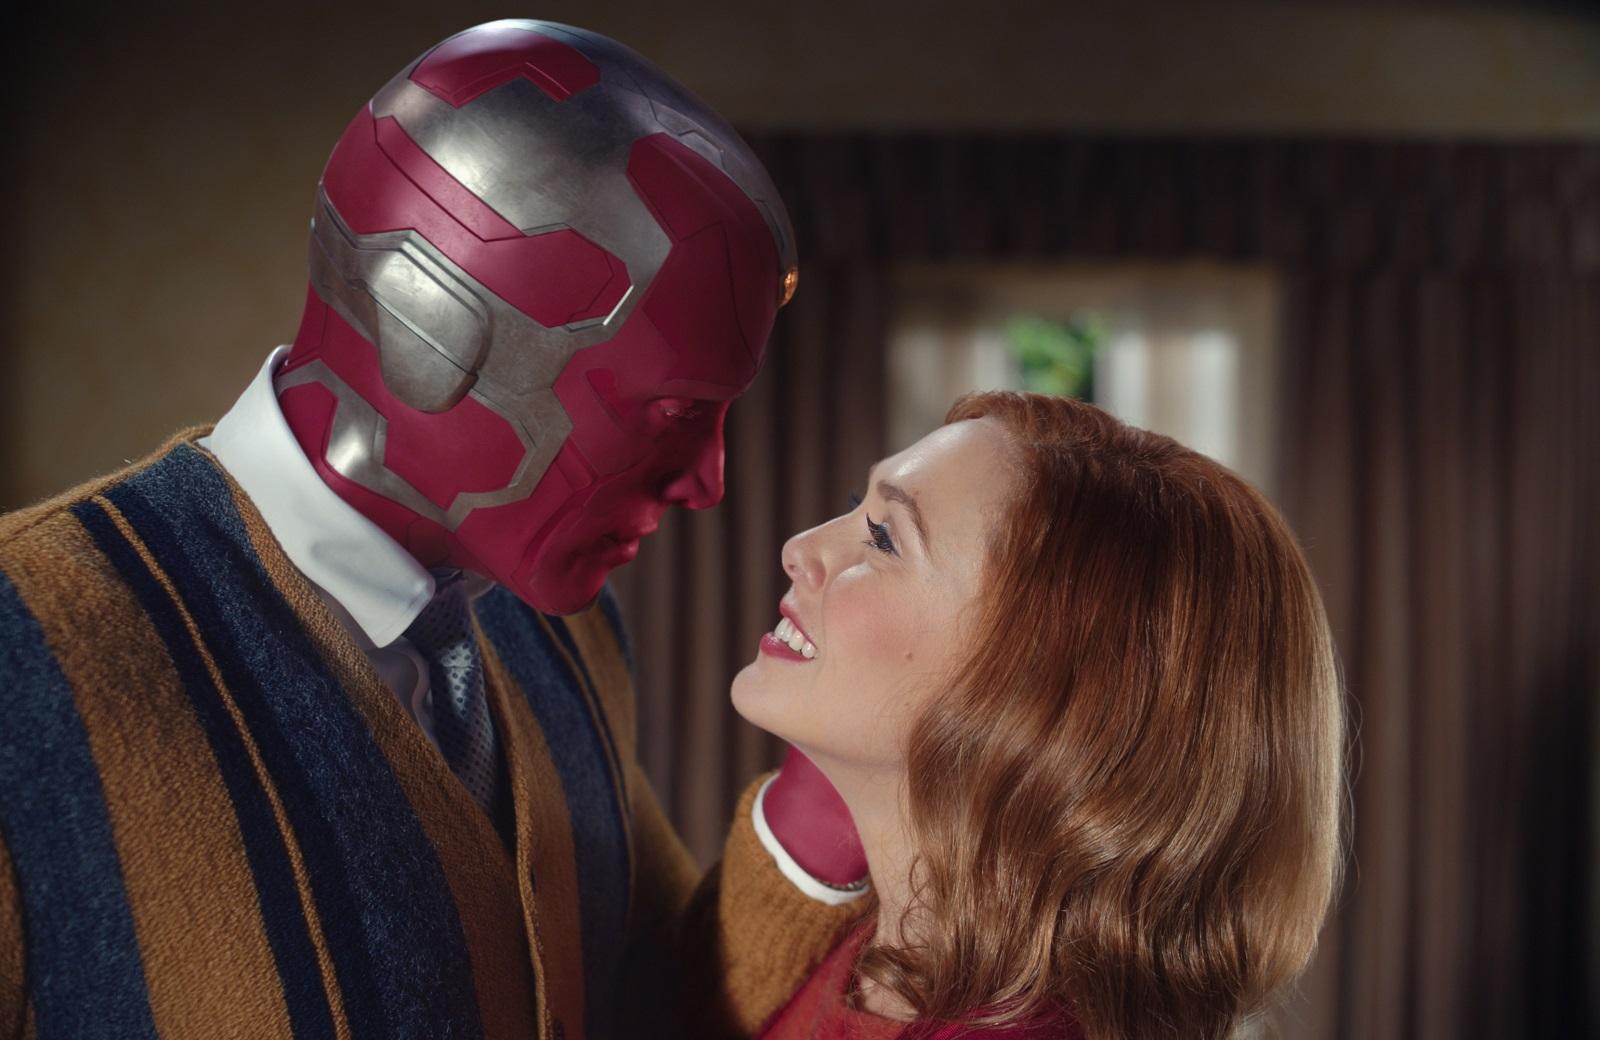 Last-minute 'WandaVision' finale leak teases a mind-blowing mutant cameo